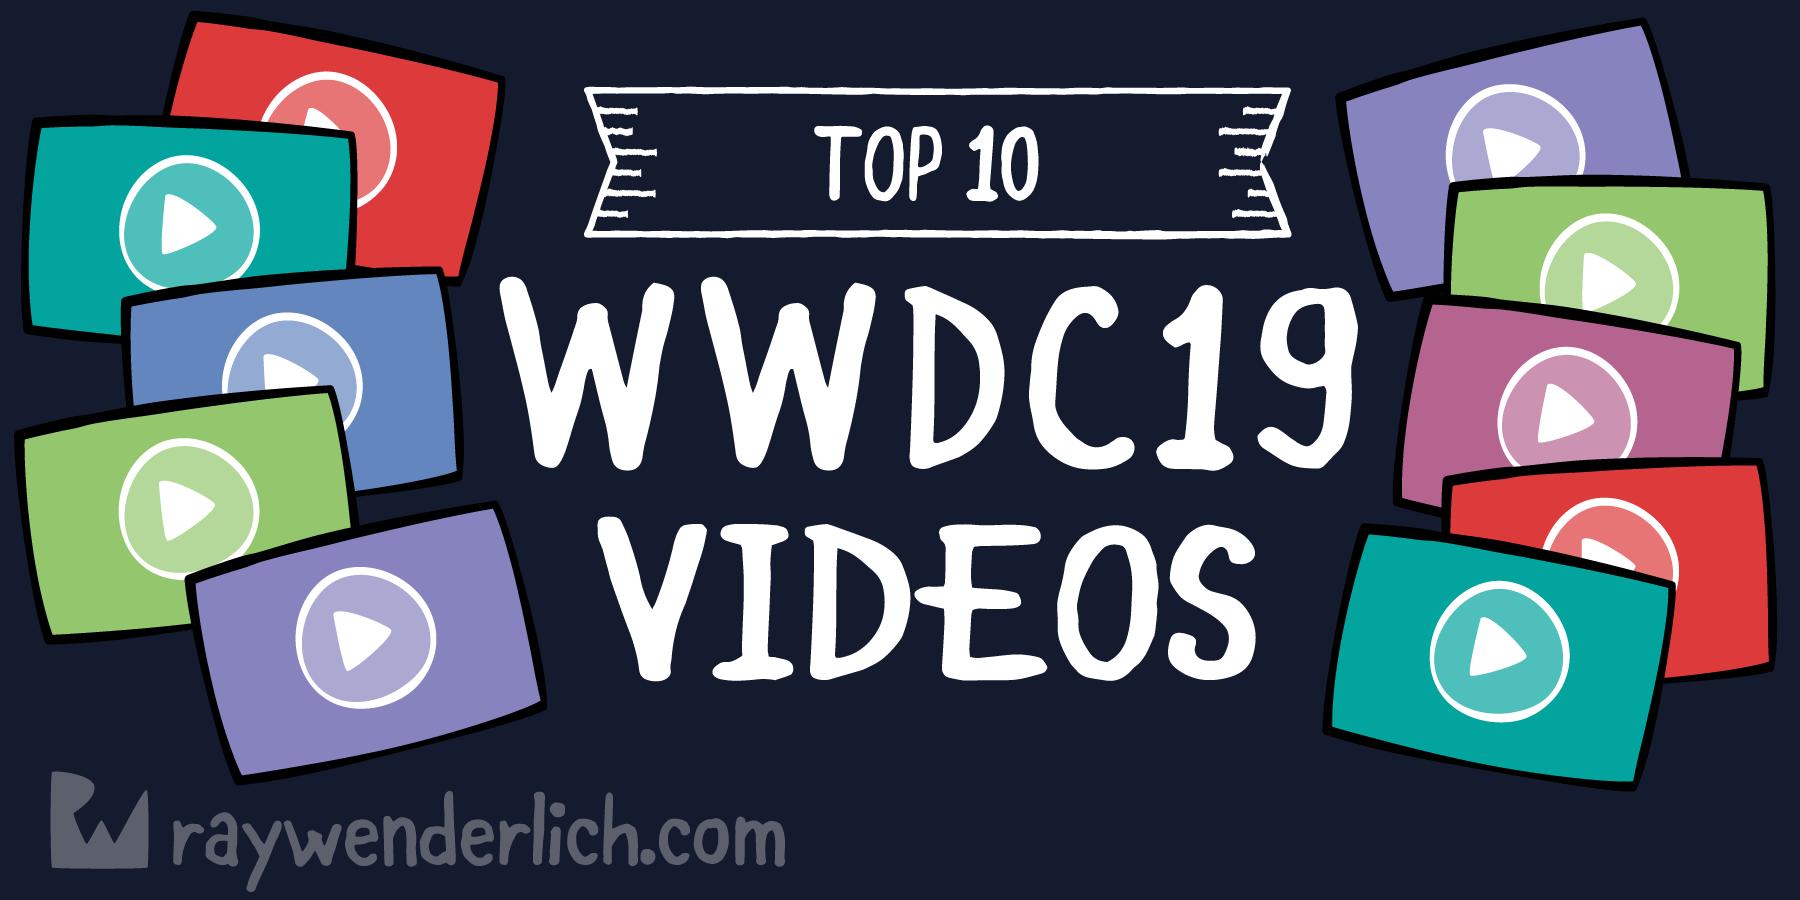 WWDC 2019 Top 10 Videos [FREE]